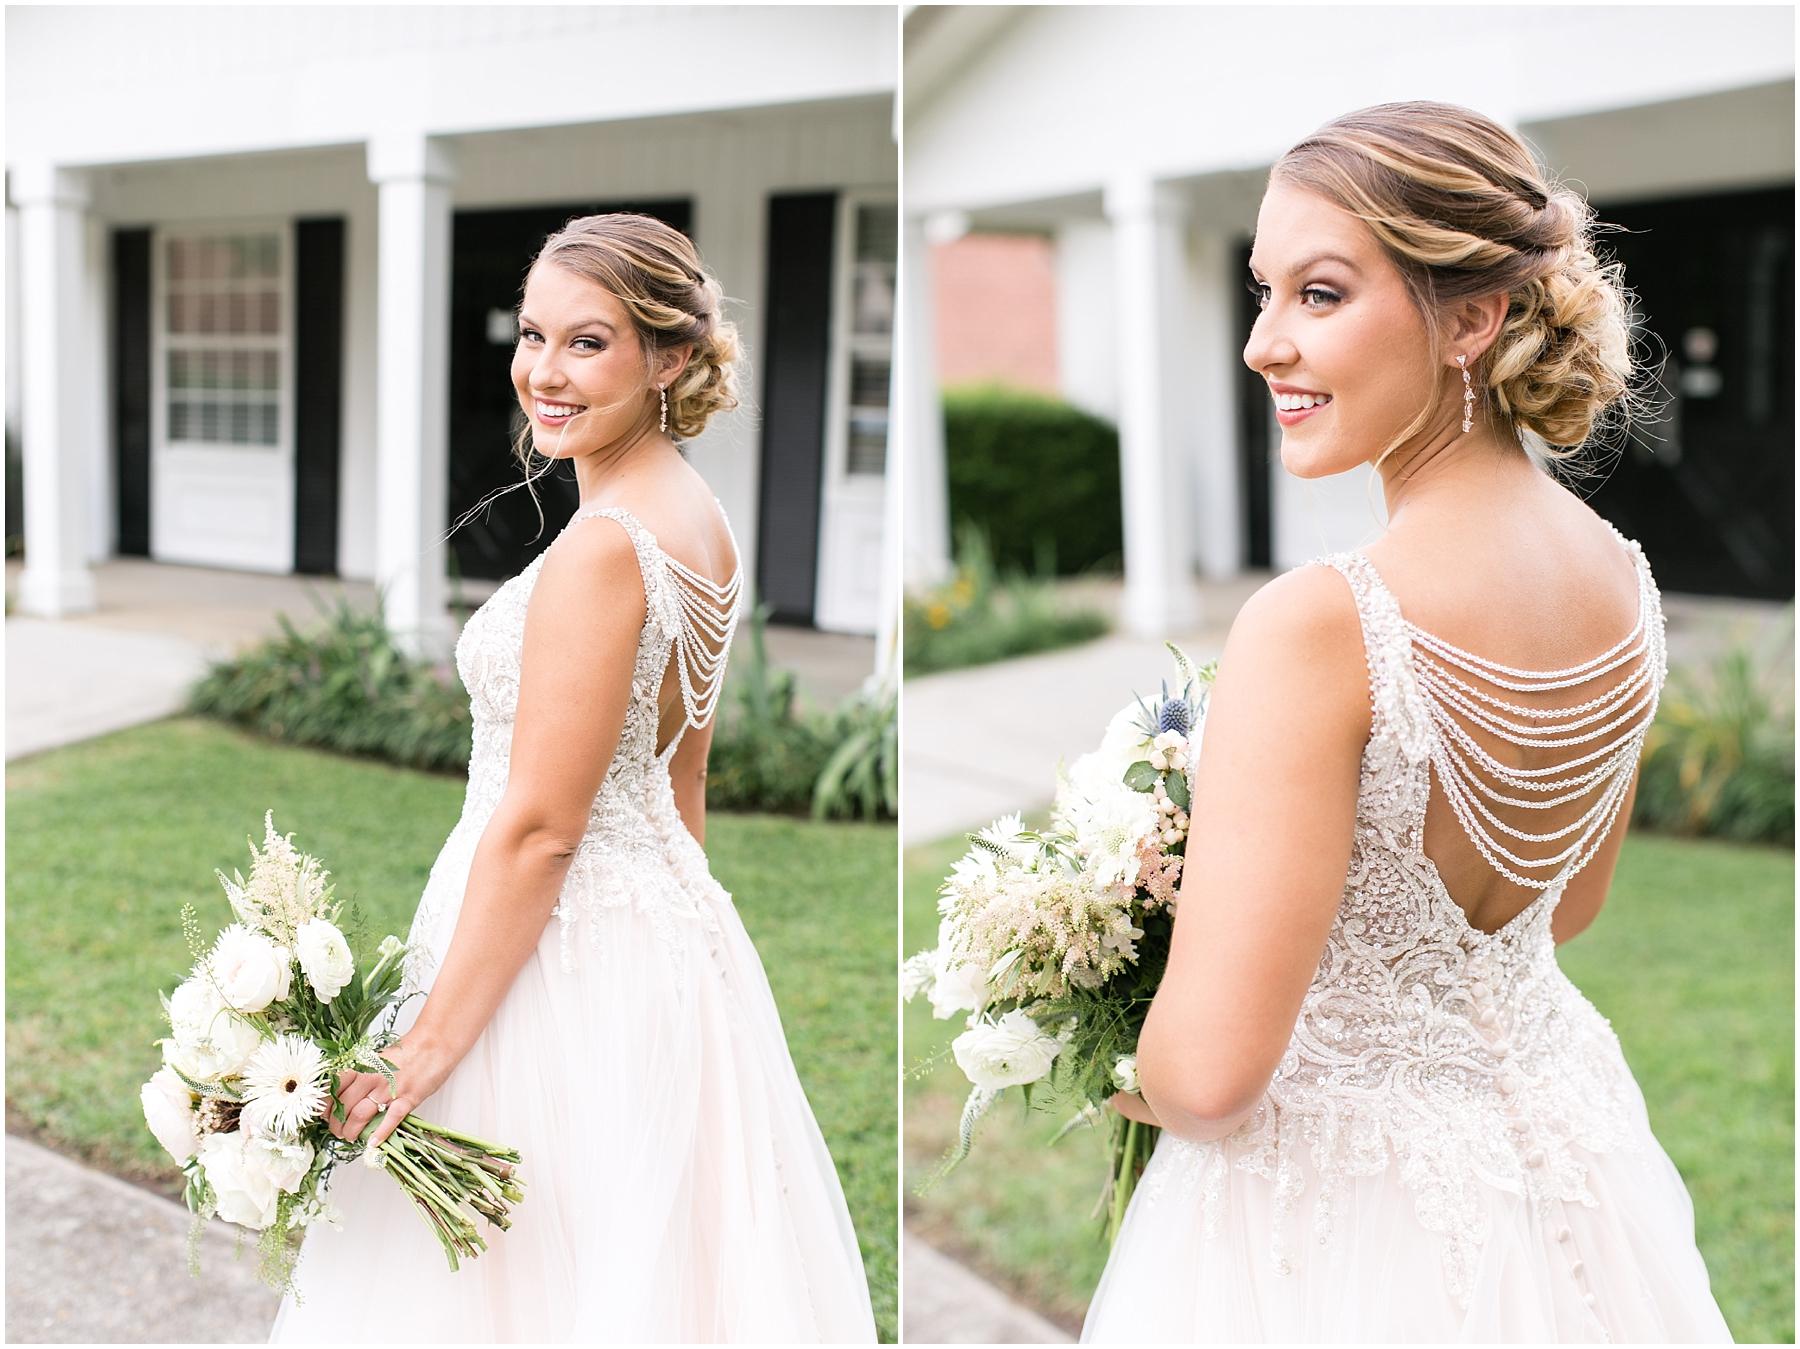 virginia beach wedding photography,here and now bridal wedding dress, jessica ryan photography, jessica ryan photographer, bridal portrait